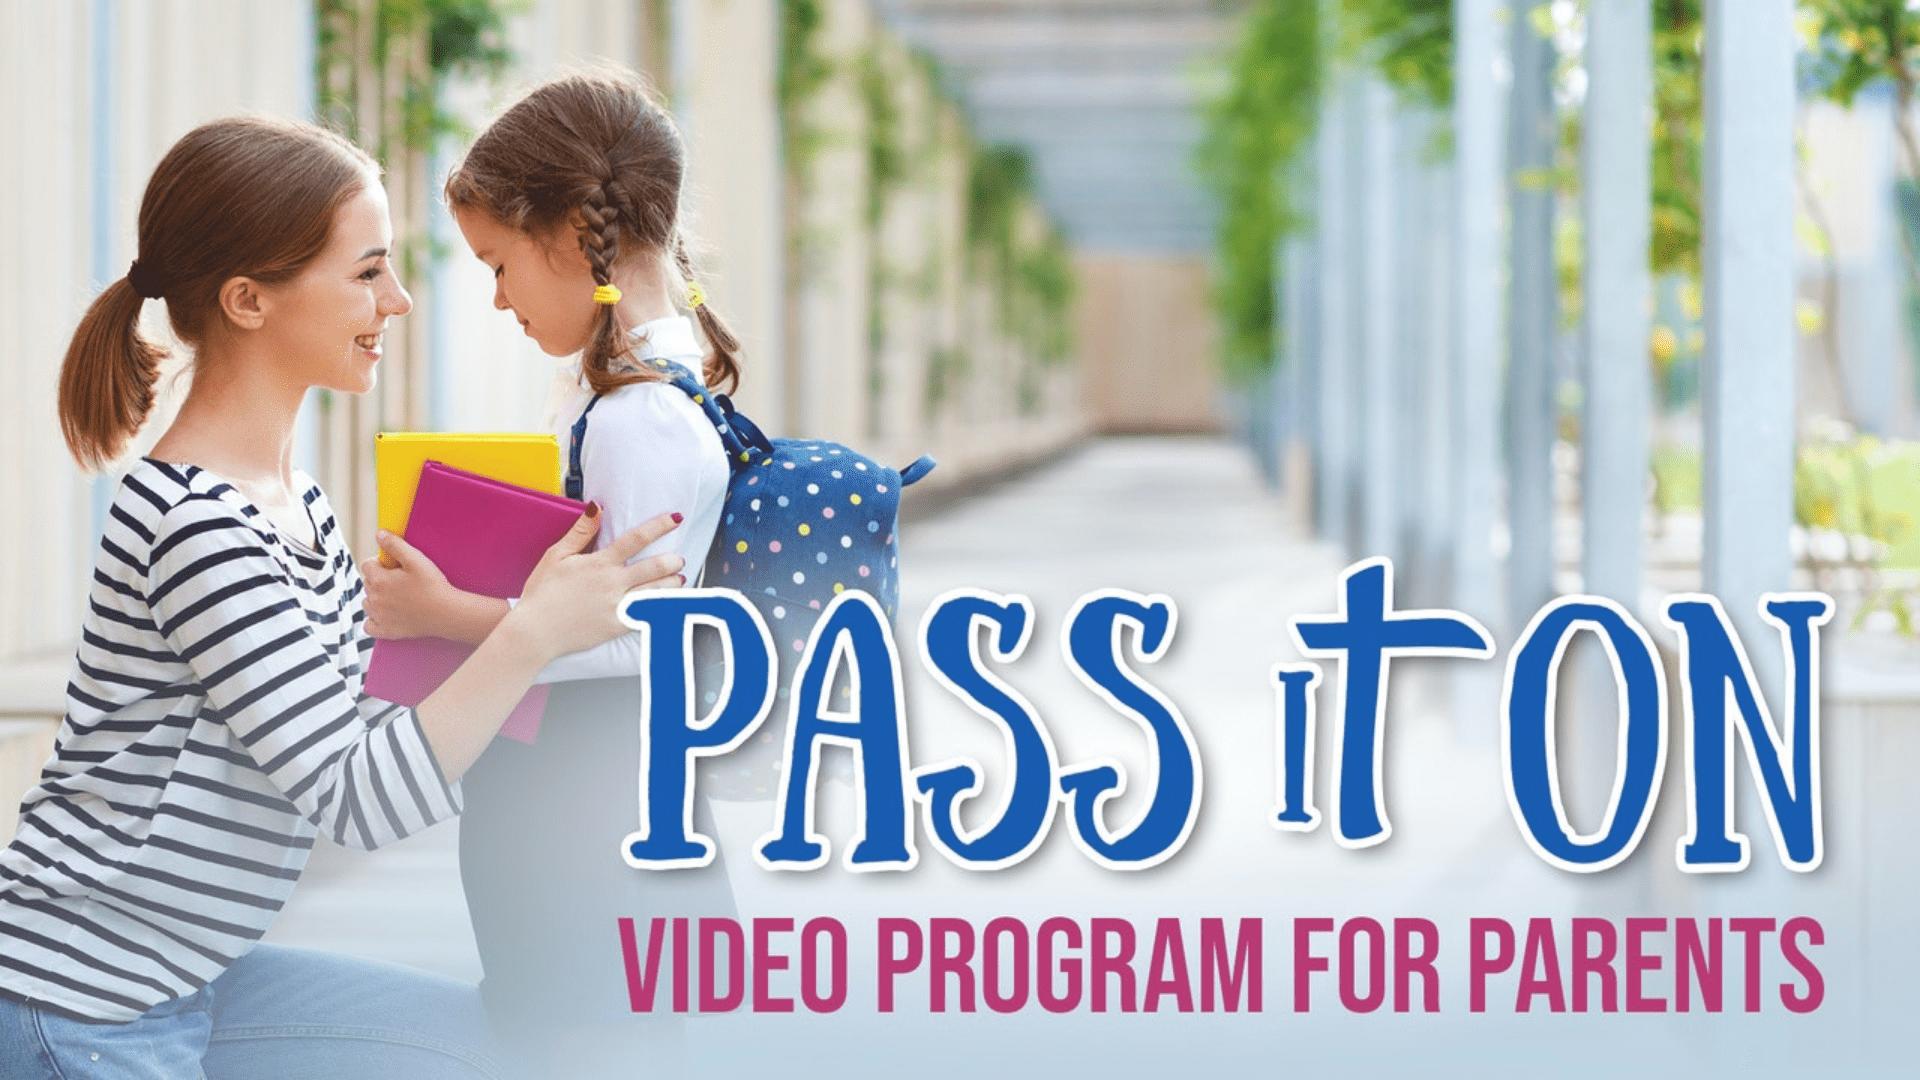 Pass It On Video Program for Parents